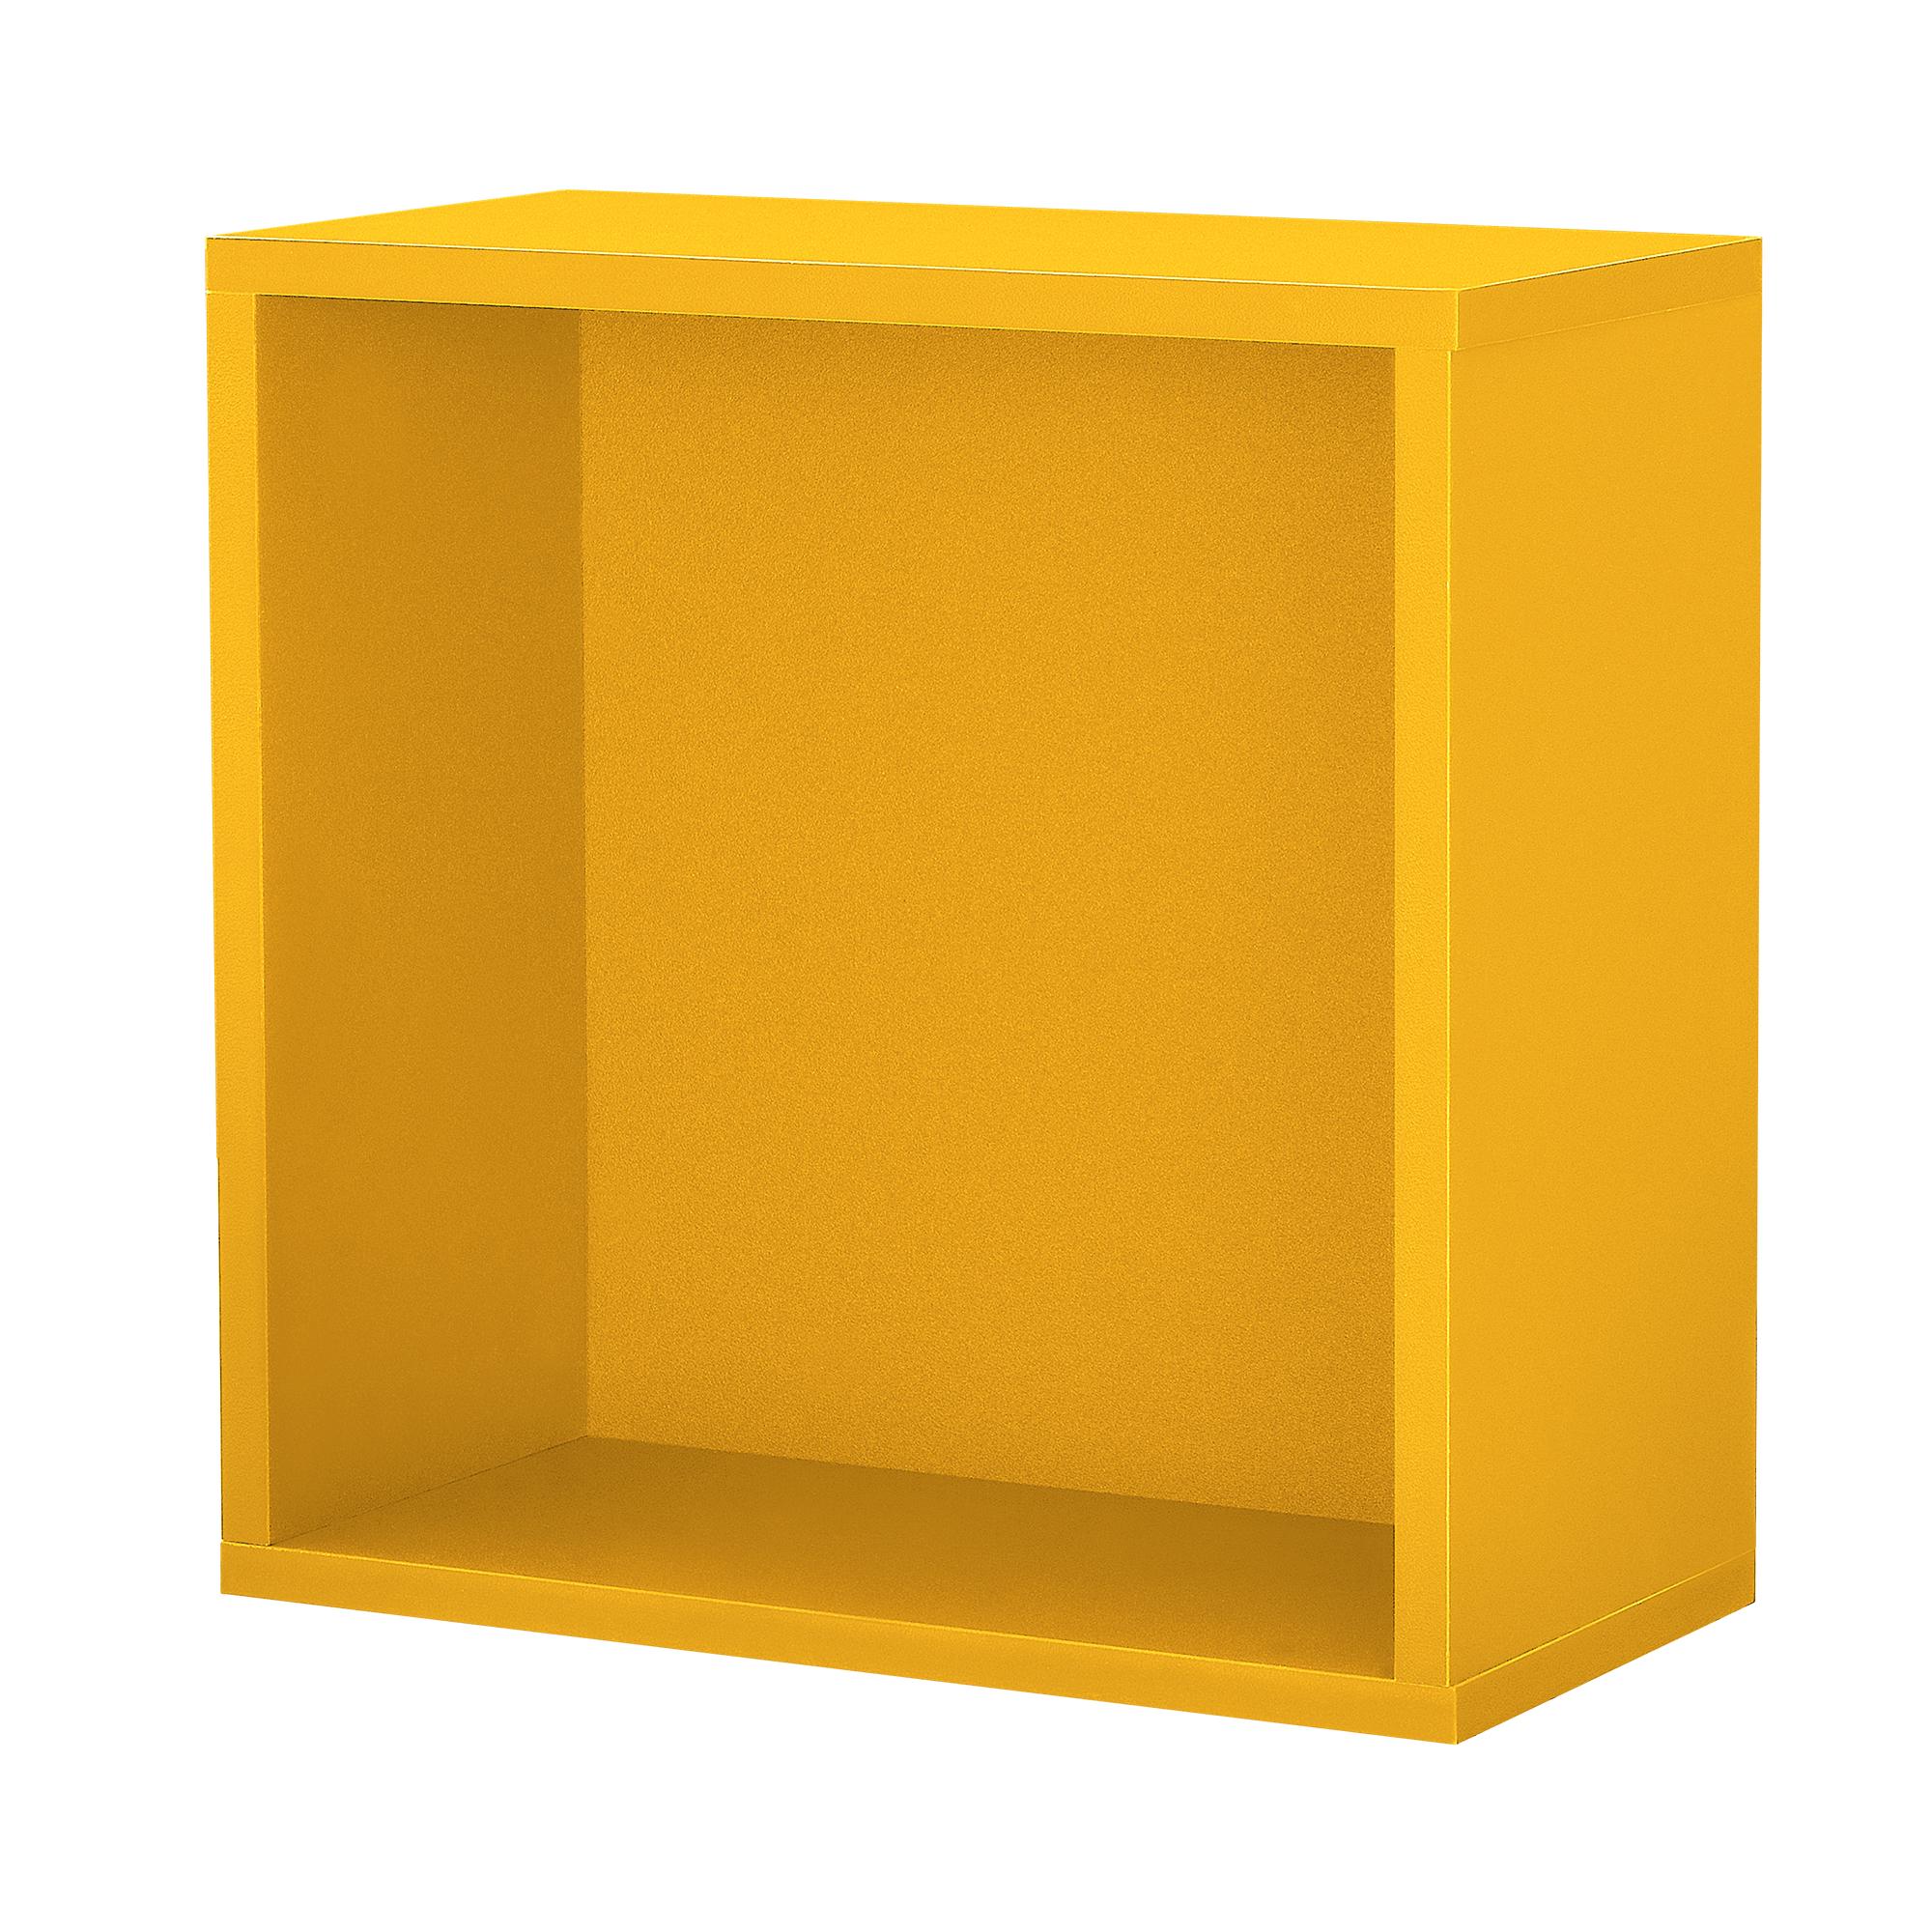 regal 30x30x15cm senfgelb wandregal b roregal h ngeregal kombinierbar 4059438114229. Black Bedroom Furniture Sets. Home Design Ideas